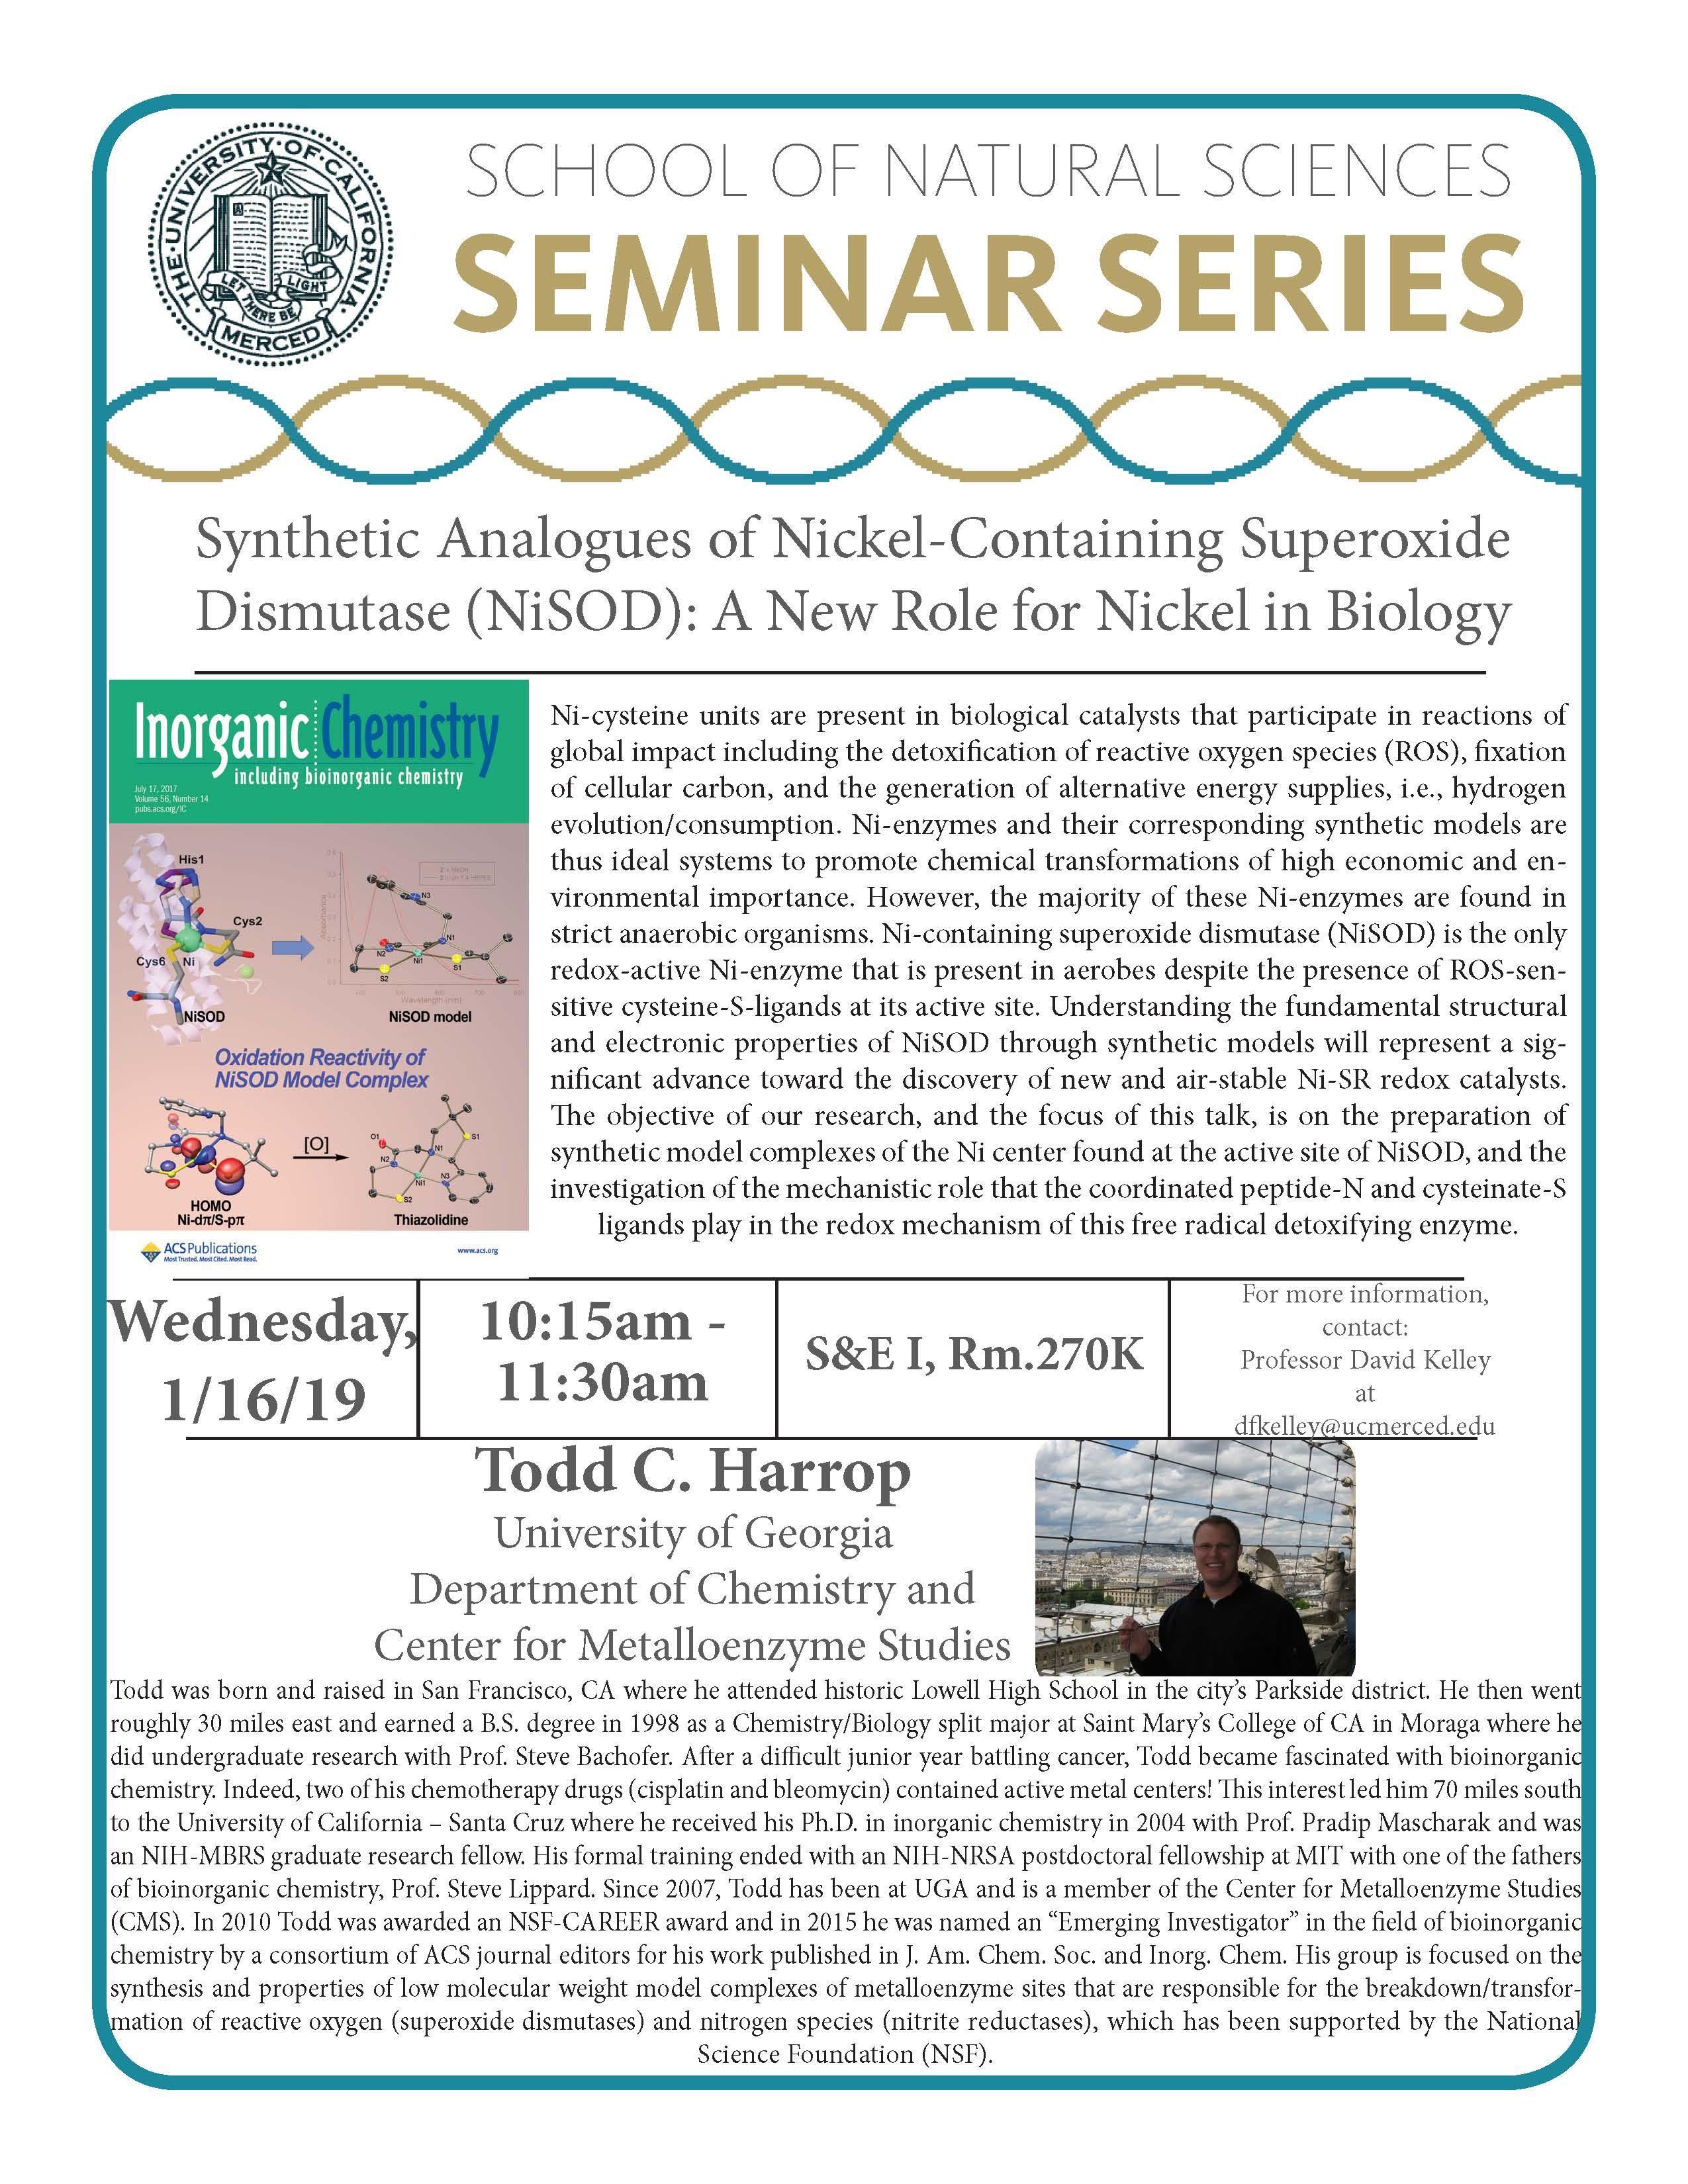 CCB Seminar - Dr. Todd C. Harrop